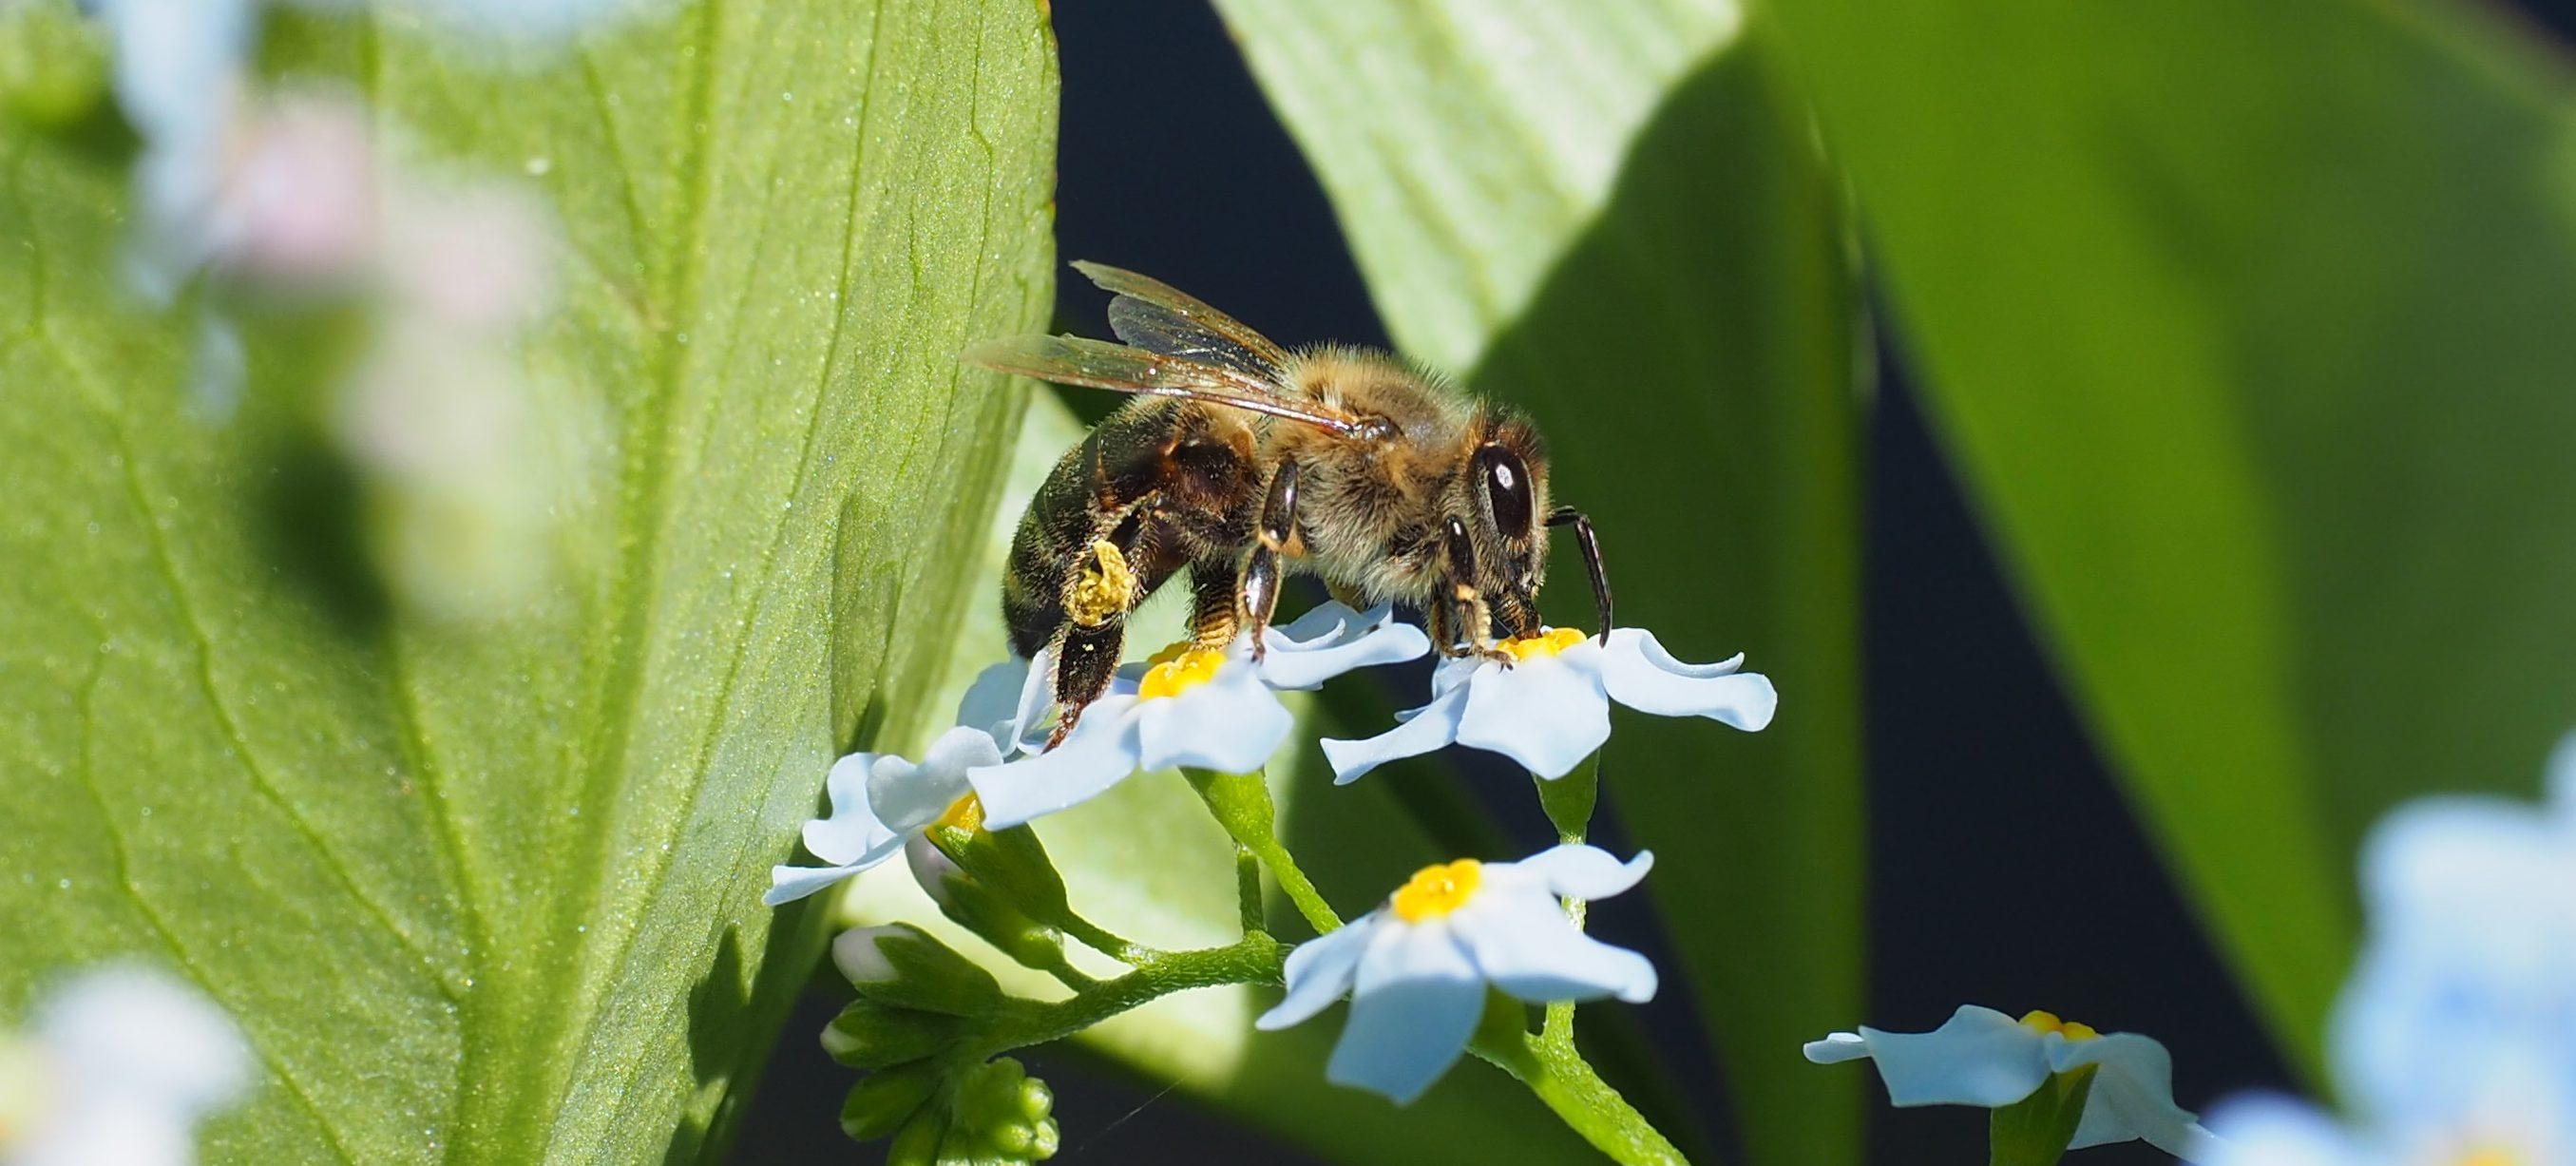 Bier i hagen og 10 spørsmål til en birøkter